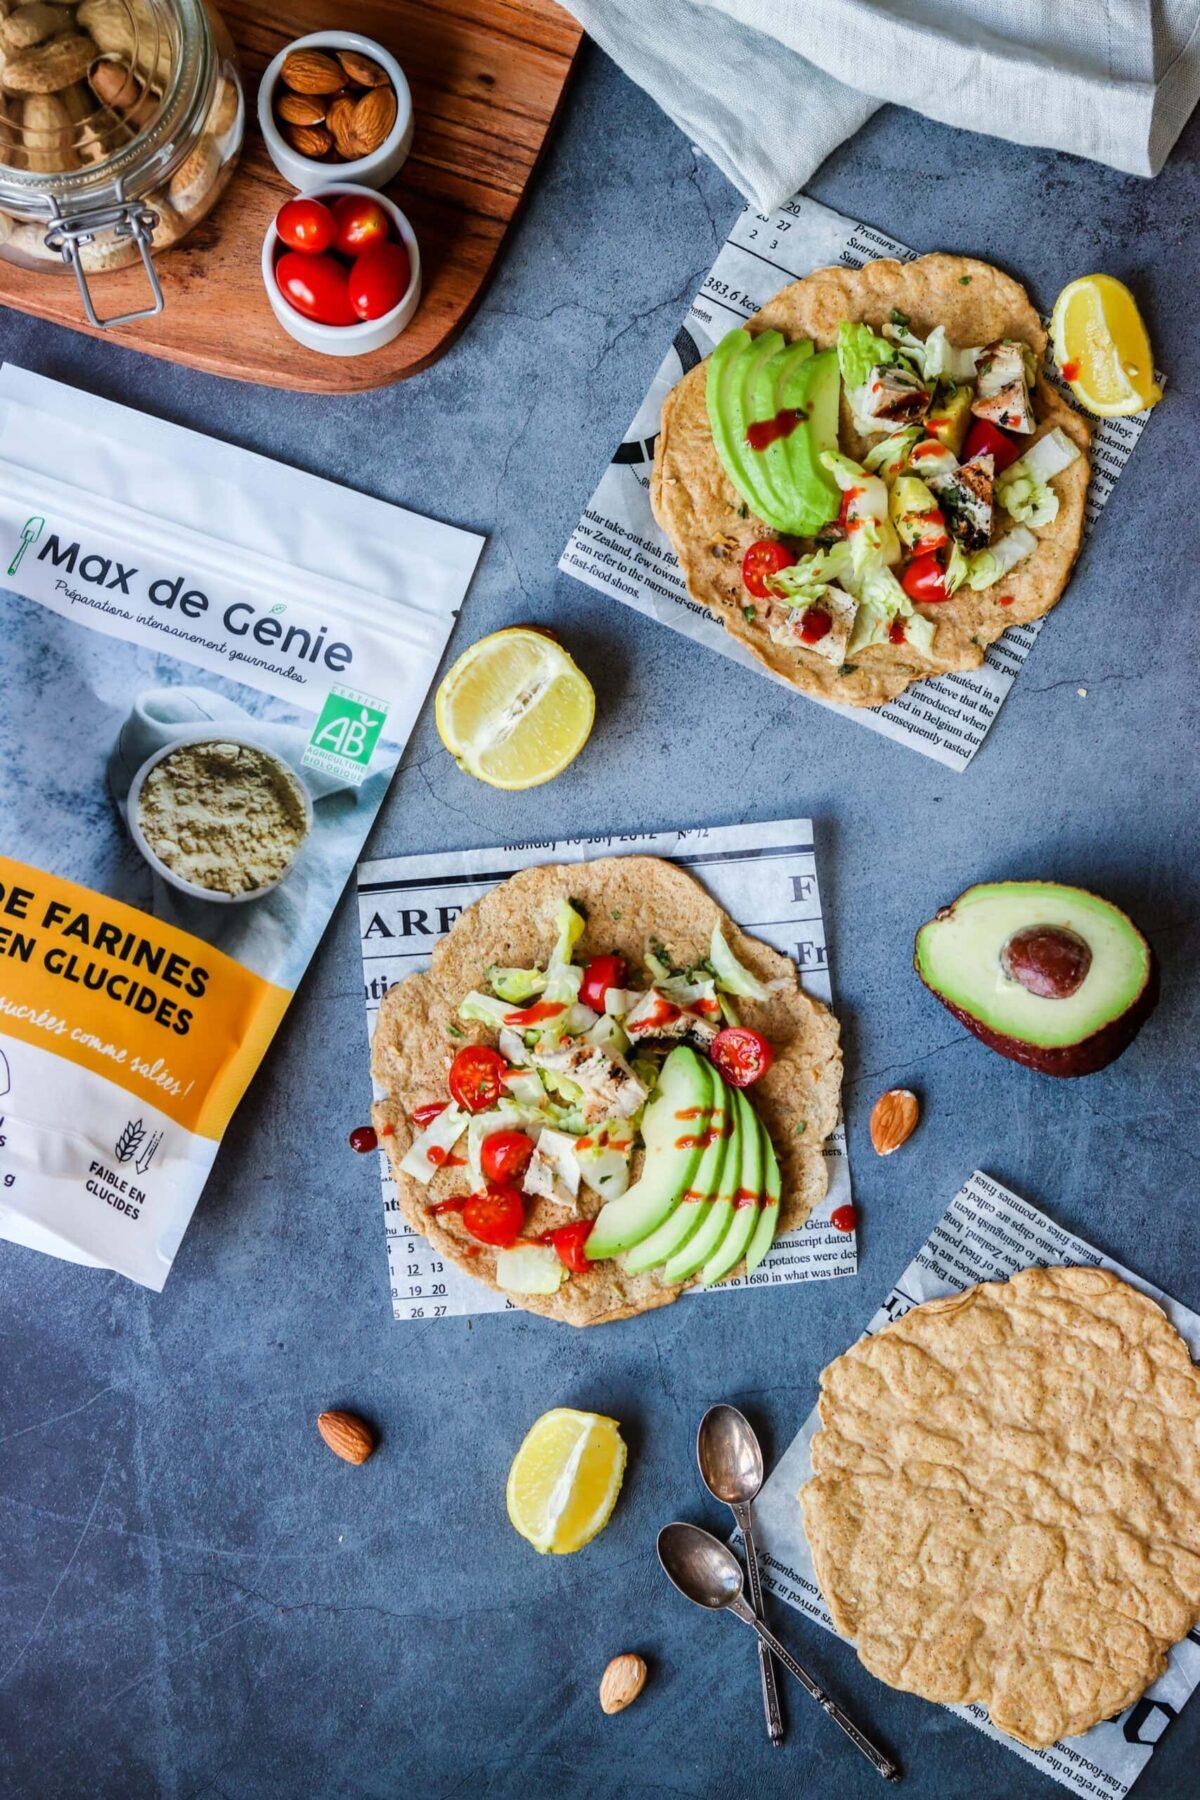 Tortillas faibles en glucides vues de haut